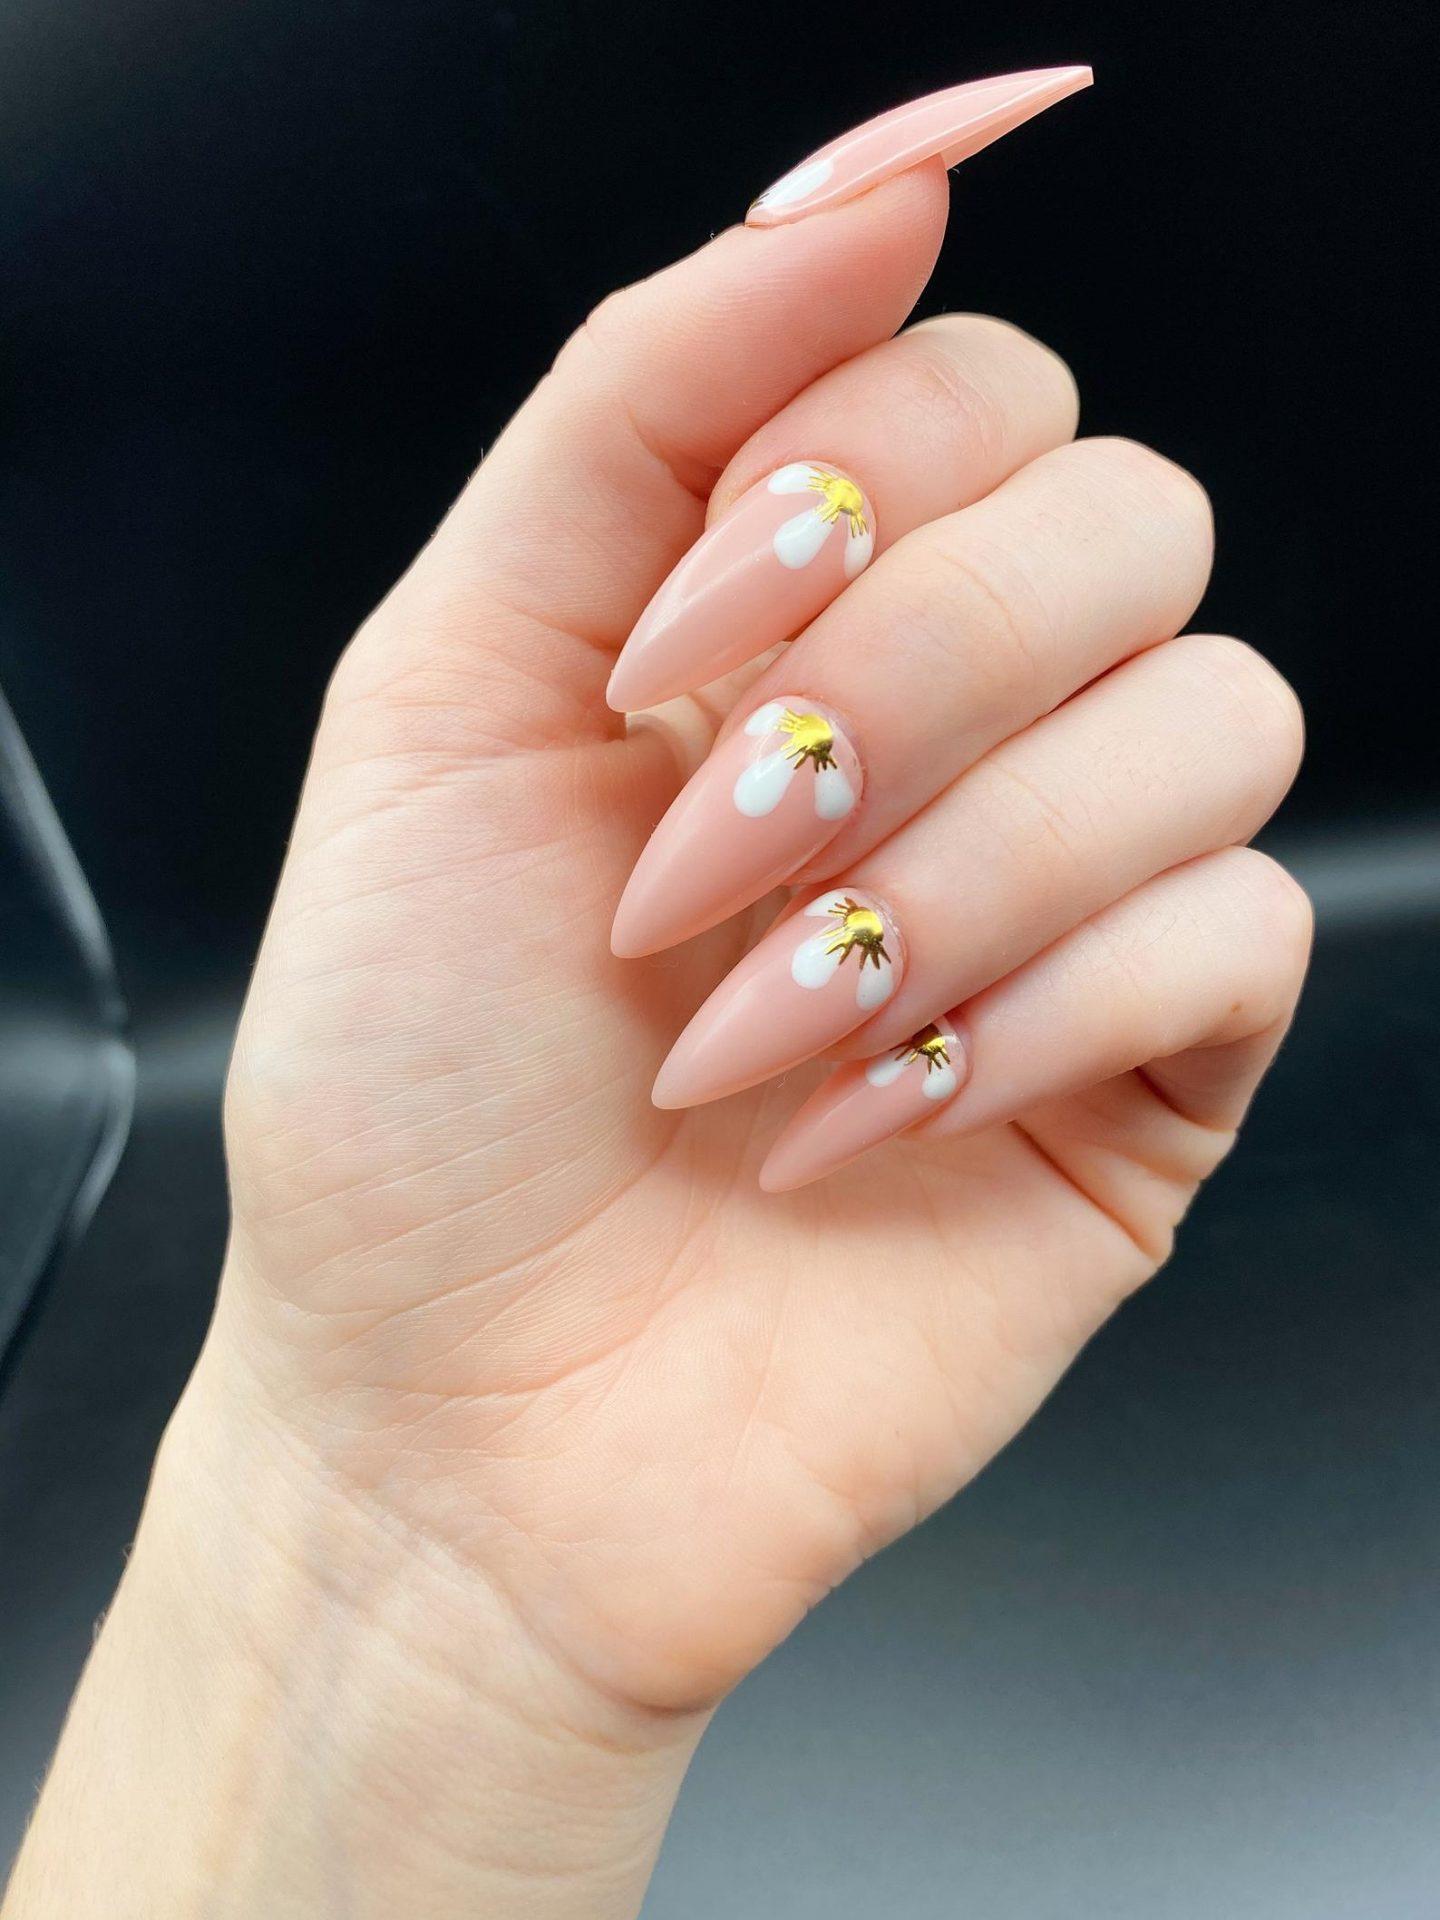 Light Pink Nails With Daisy Nail Art